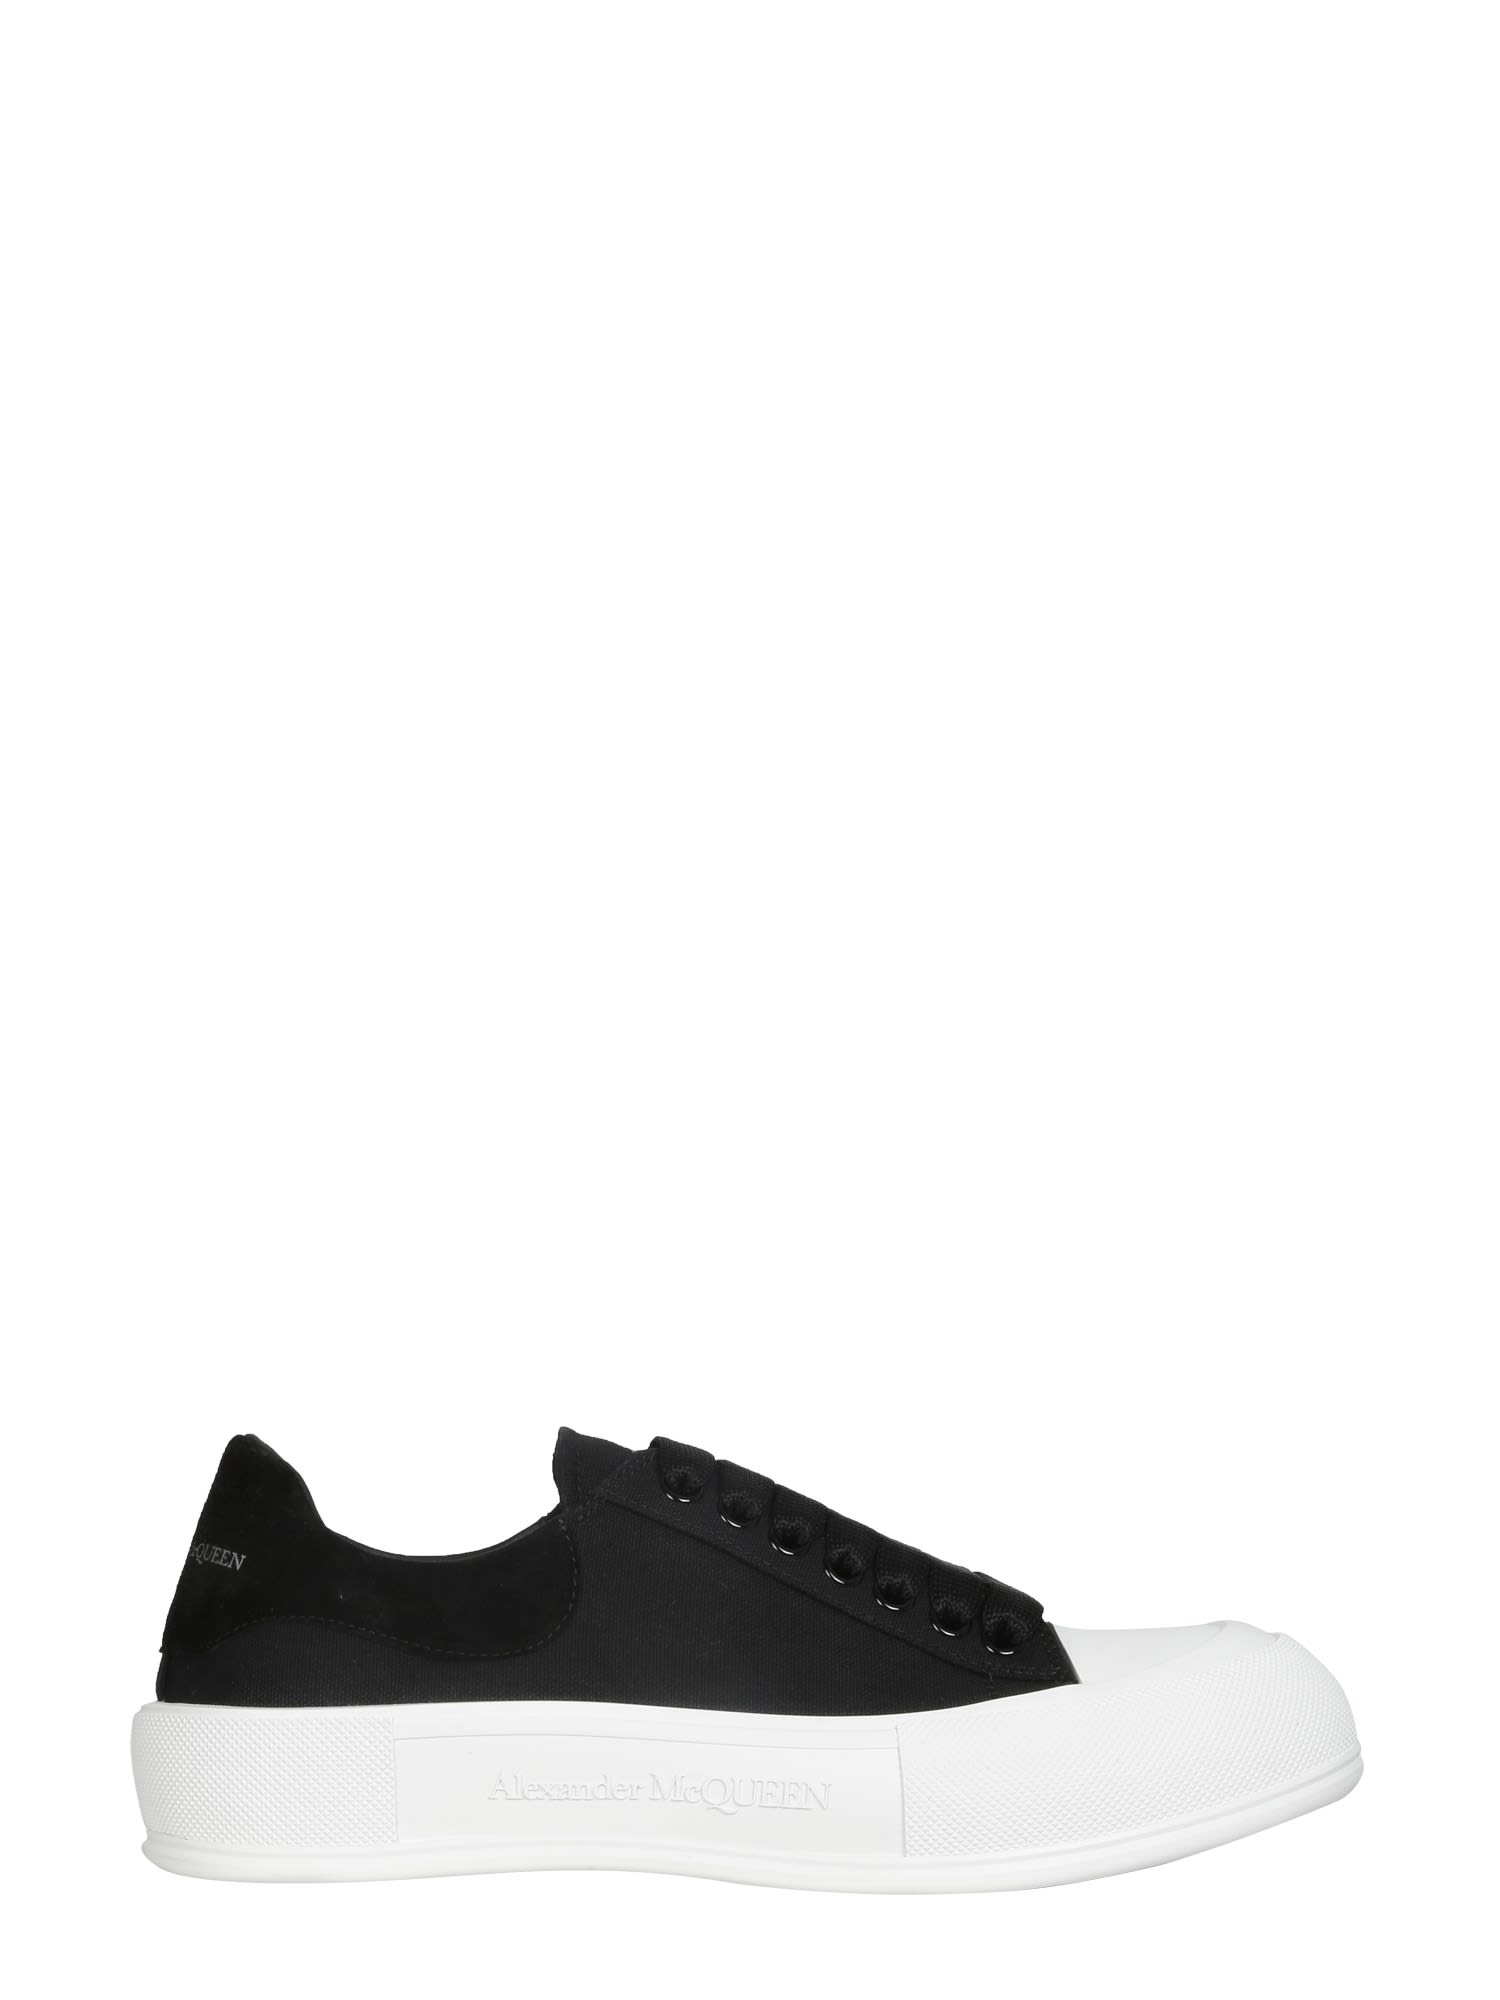 Alexander Mcqueen Skate Sneakers In Nero